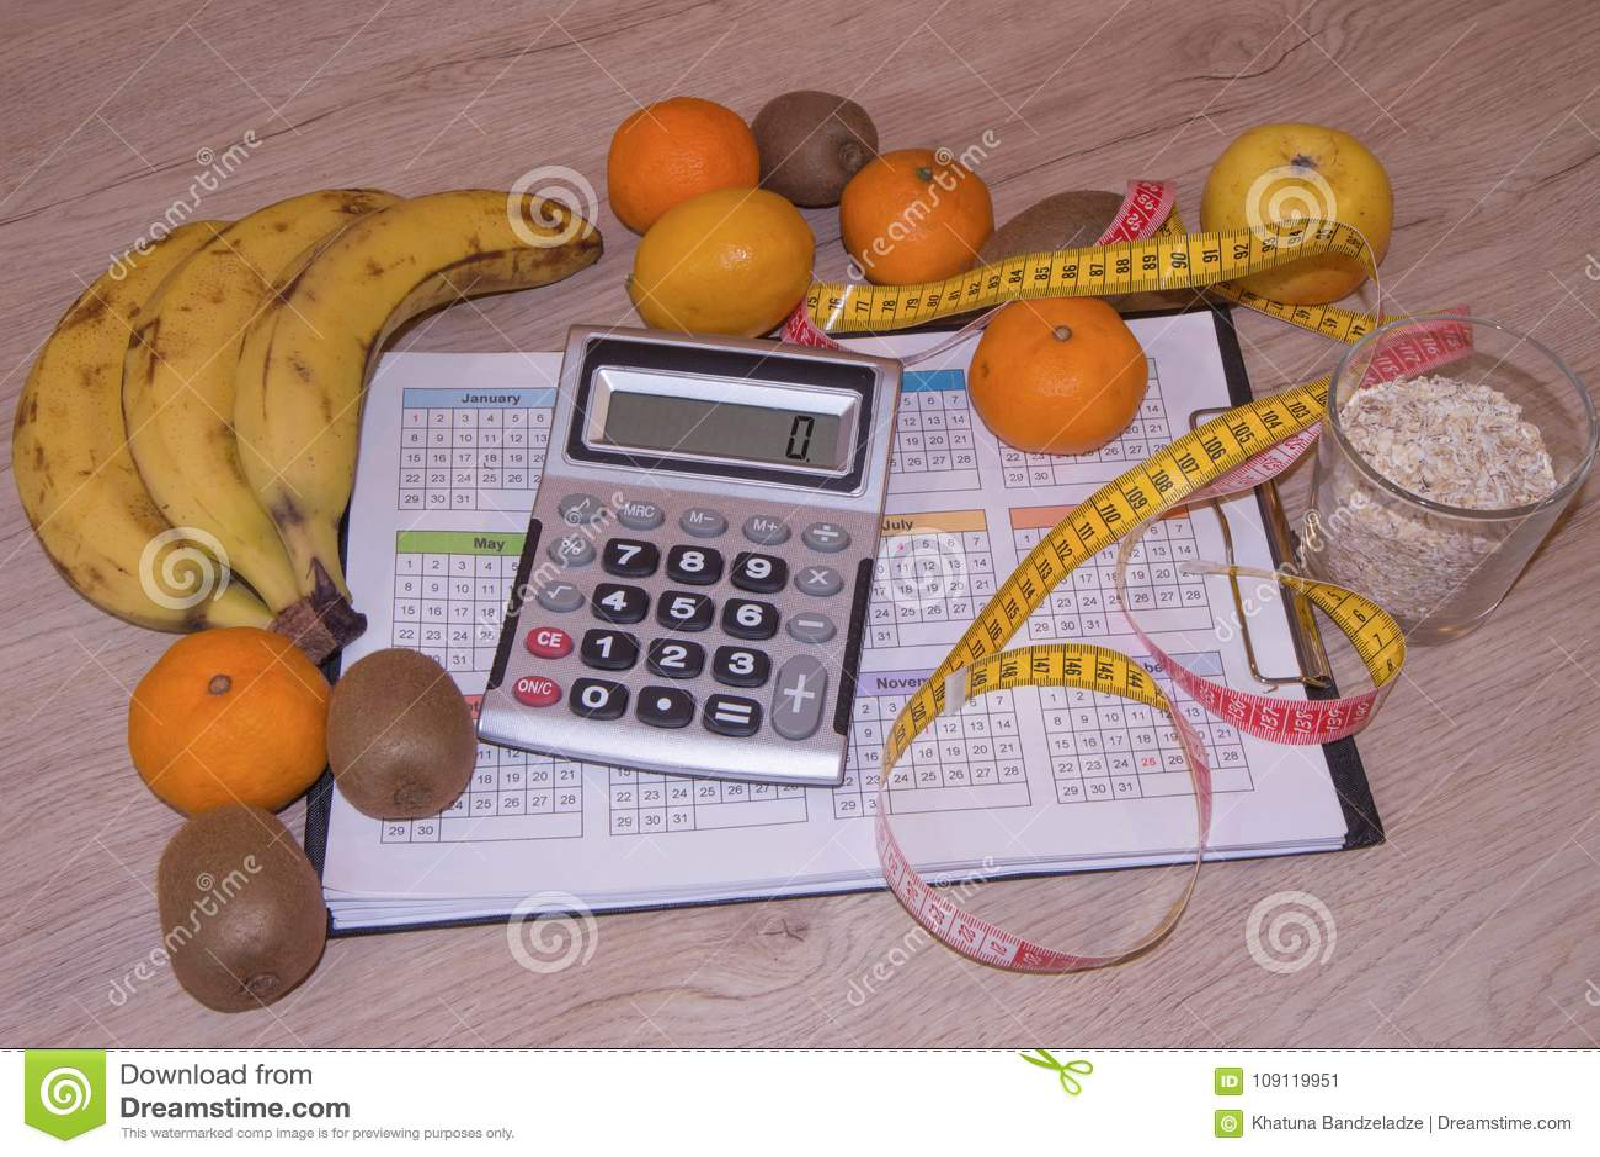 fruta fresca dieta pérdida de peso